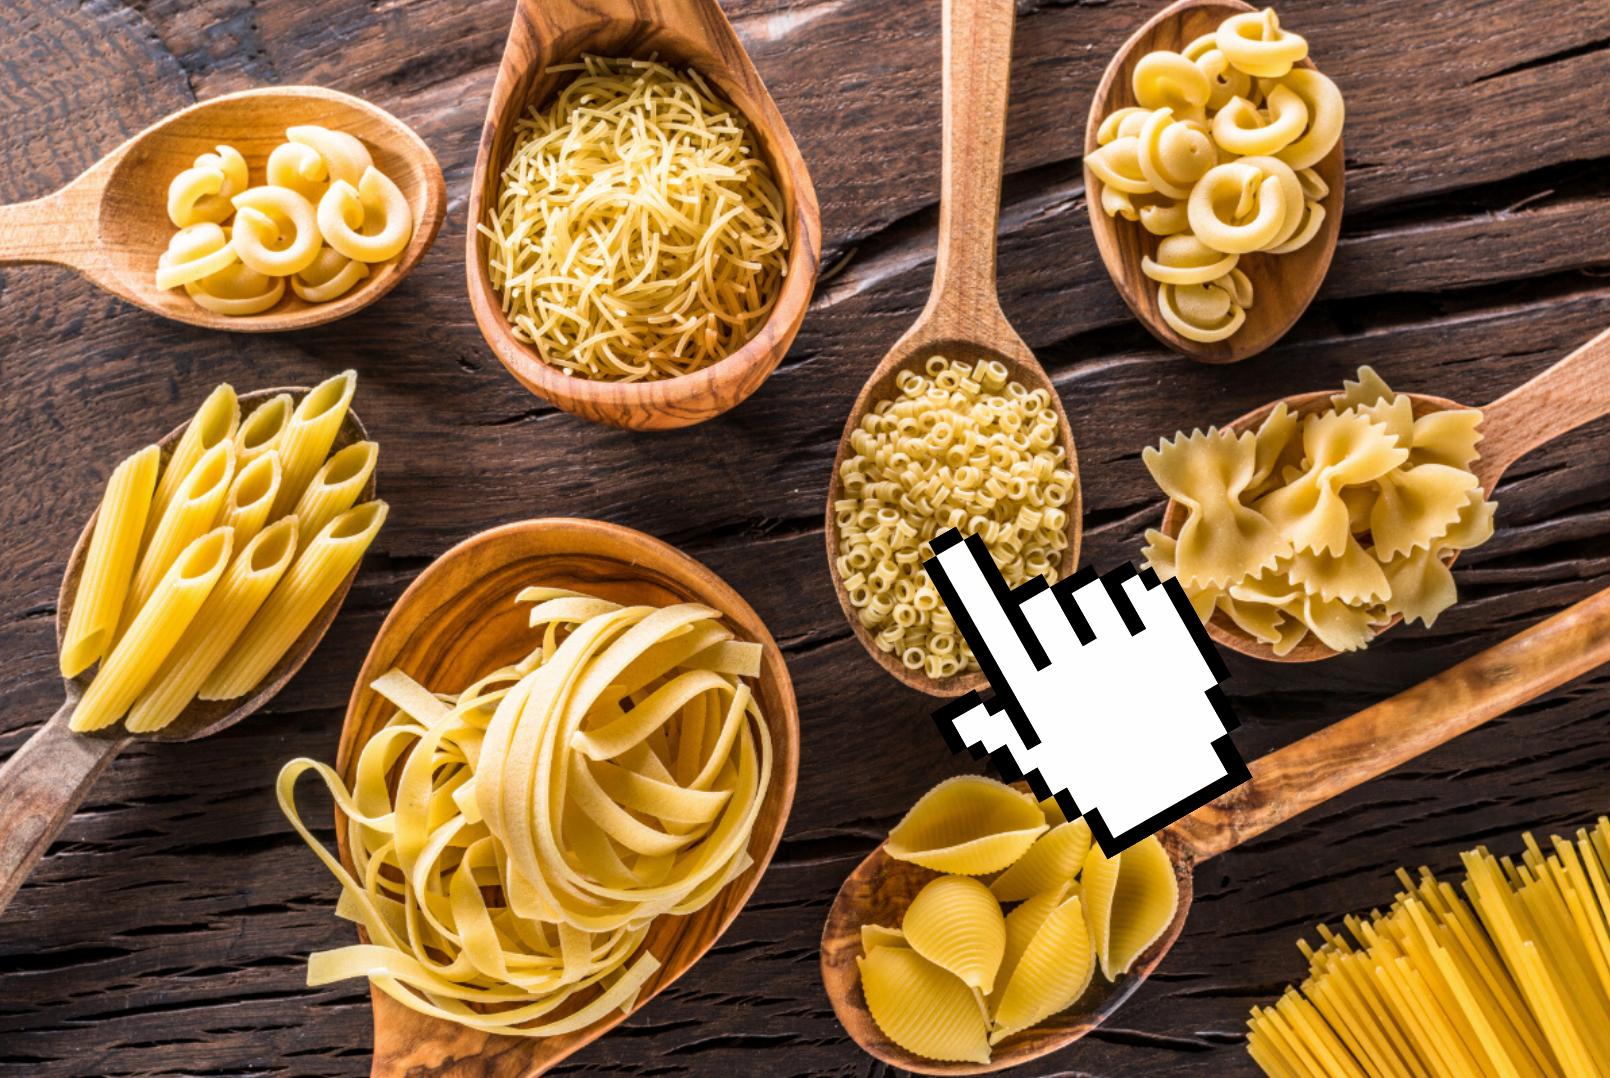 pasta barilla red orbit blog